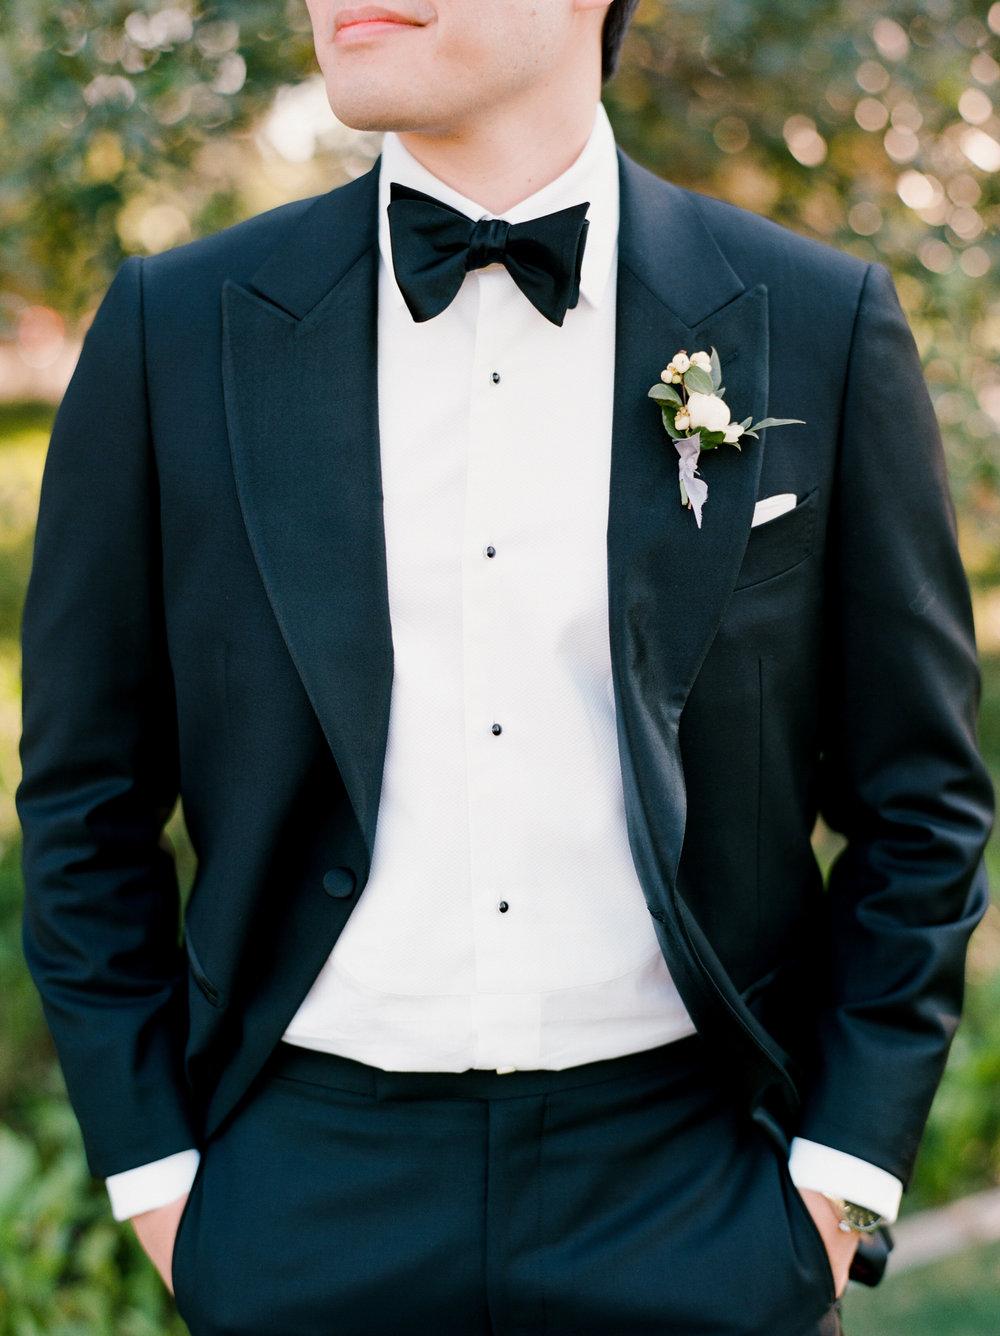 Martha-Stewart-Wedding-Dana-Fernandez-Photography-Josh-Texas-Film-Houston-Wedding-Fine-Art-Photographer-McGovern-Centennial-Gardens-Top-Best-15.jpg